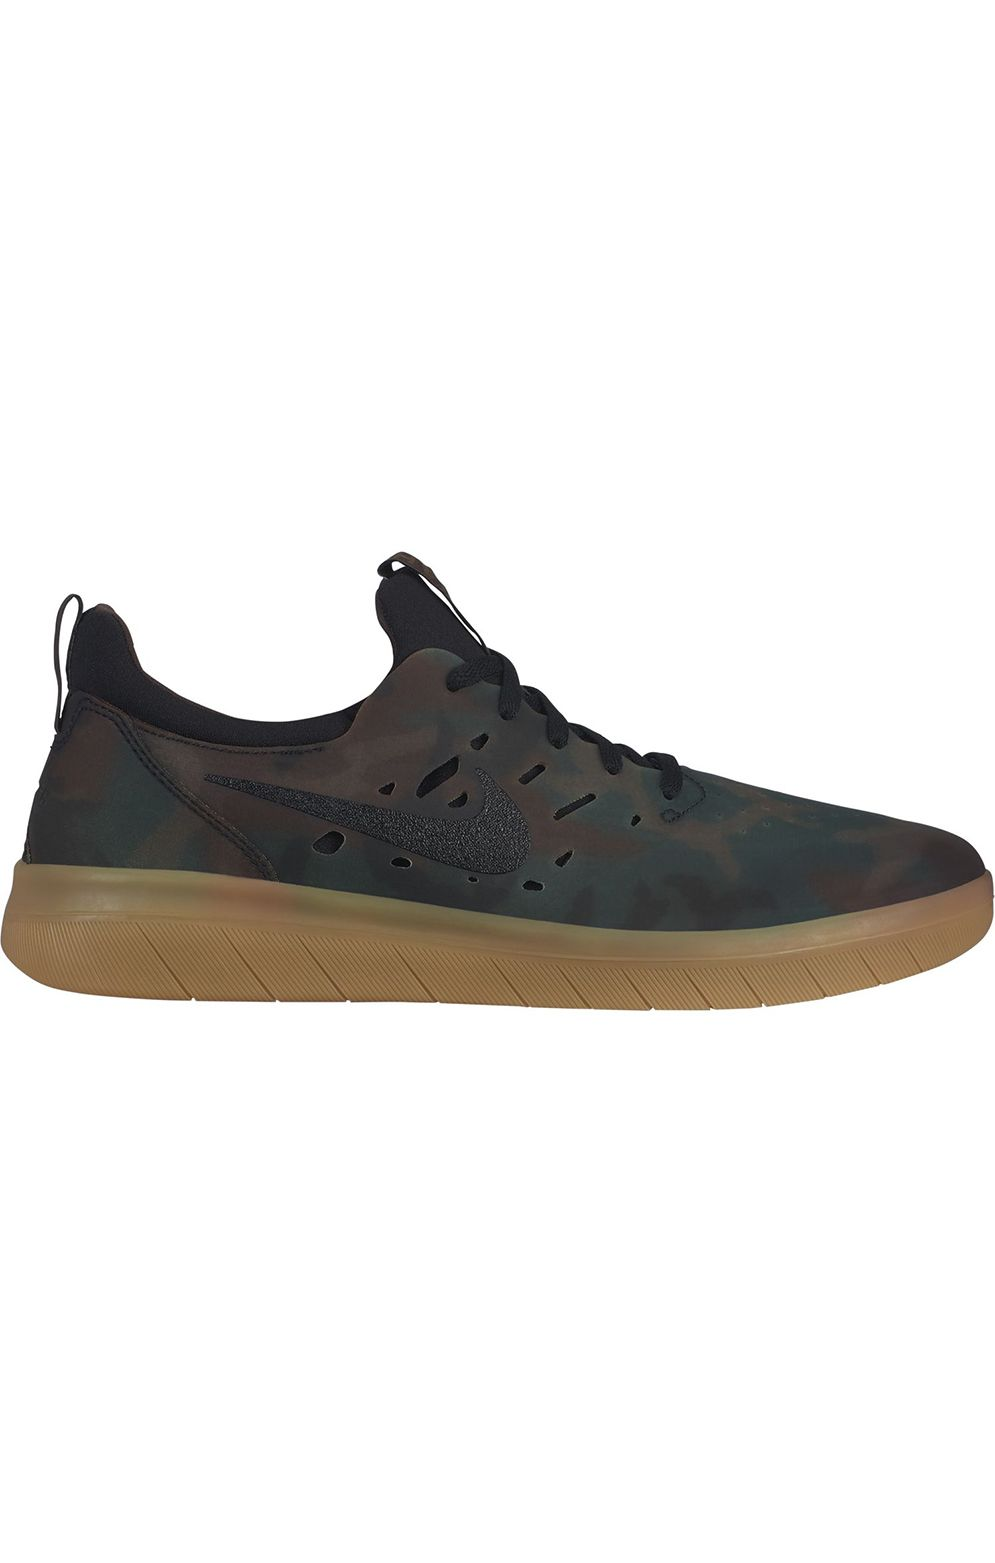 Tenis Nike Sb NYJAH FREE PRM Multi-Color/Black-Gum Lt Brown